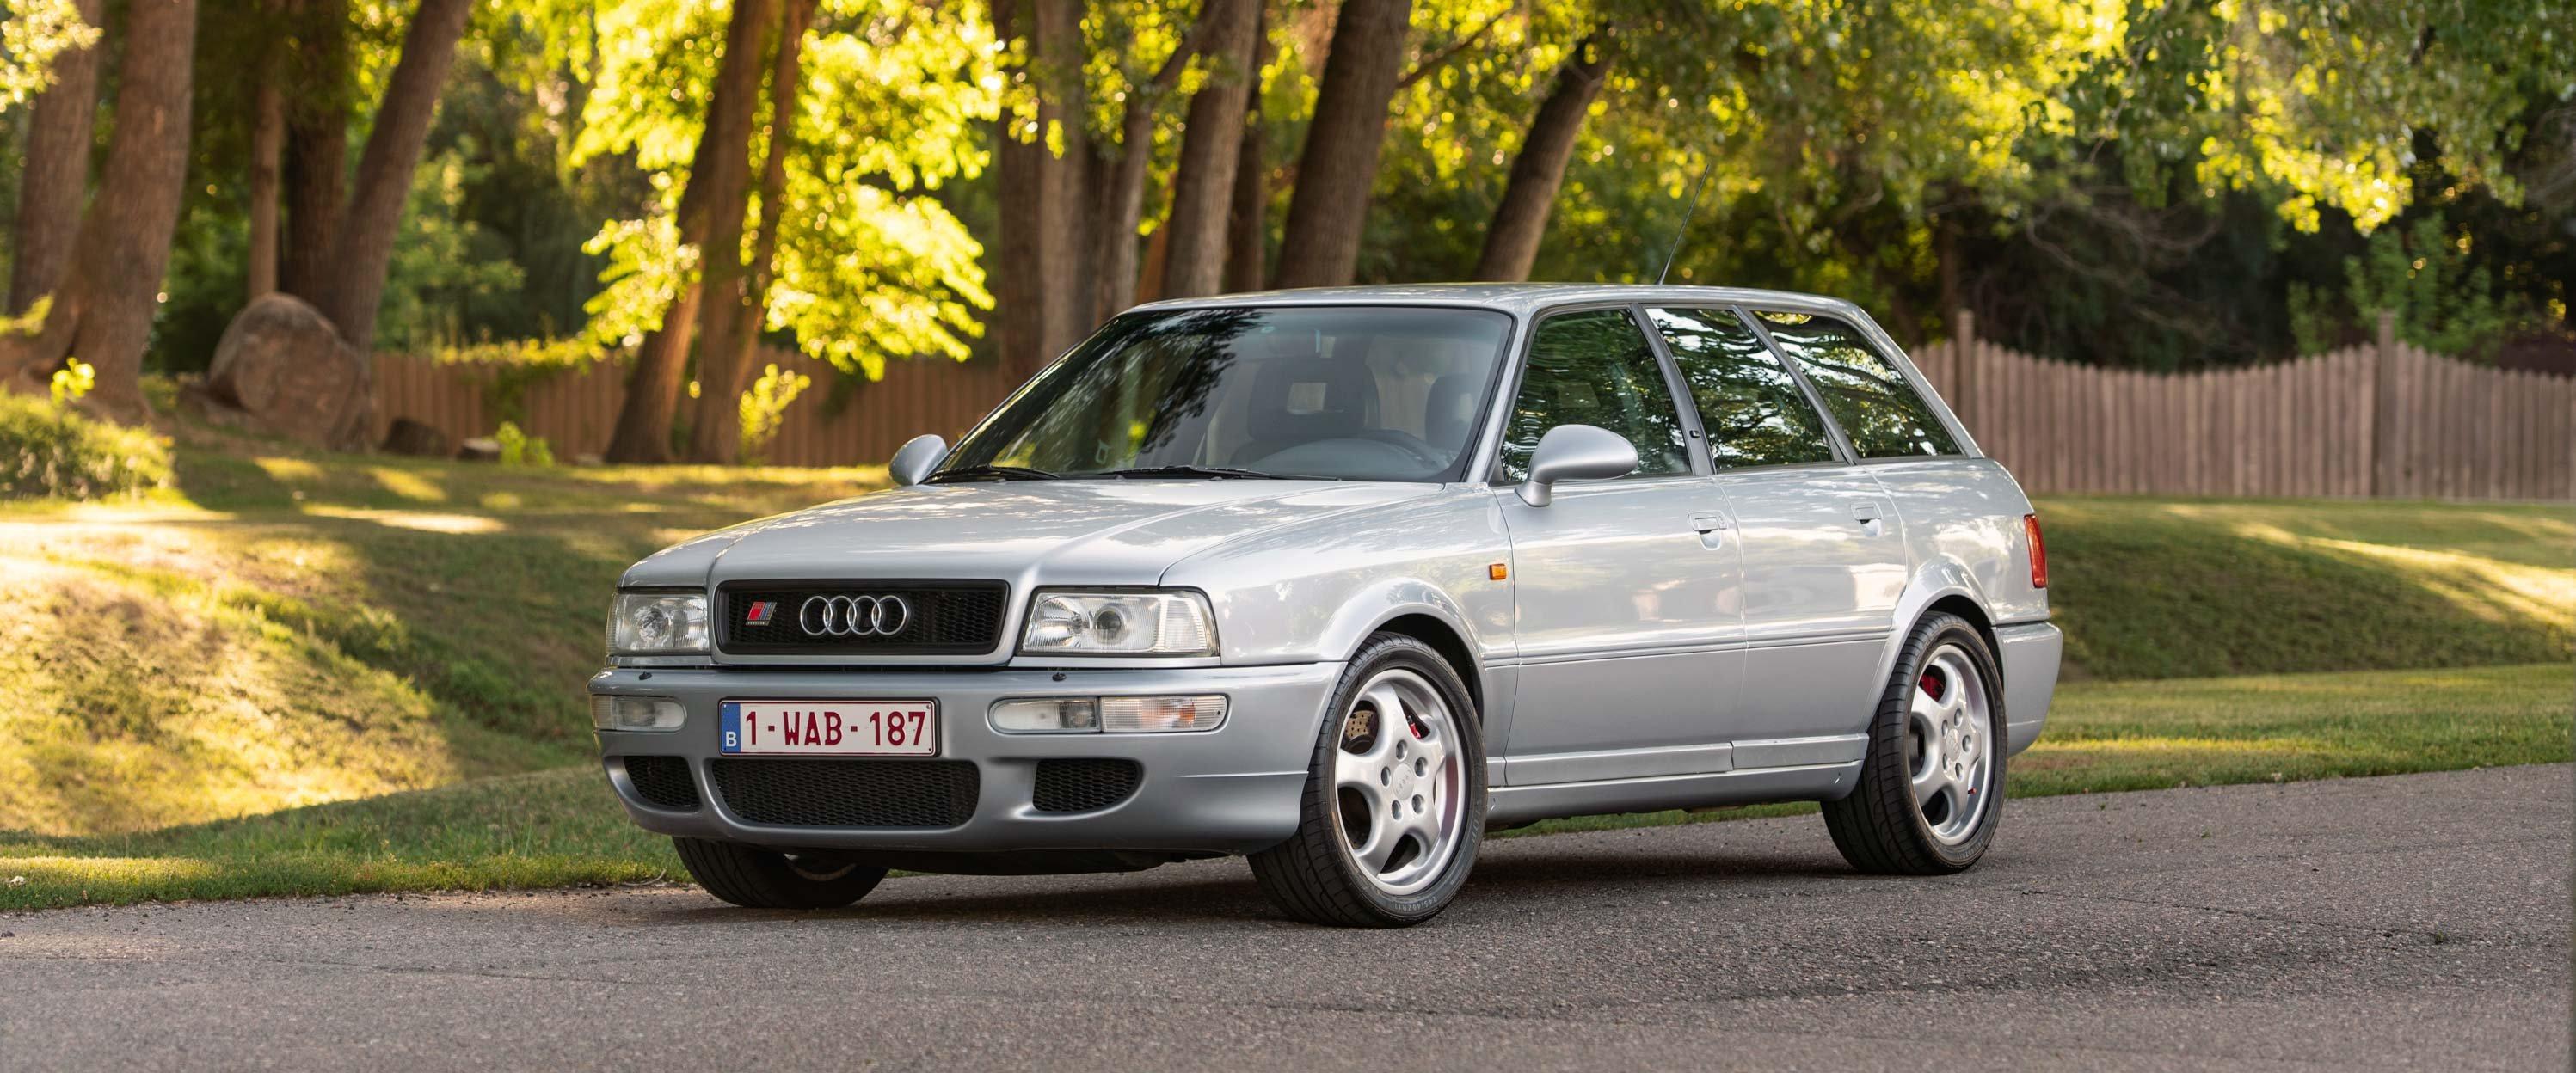 1994-Audi-RS2-Silver-slideshow-003@2x